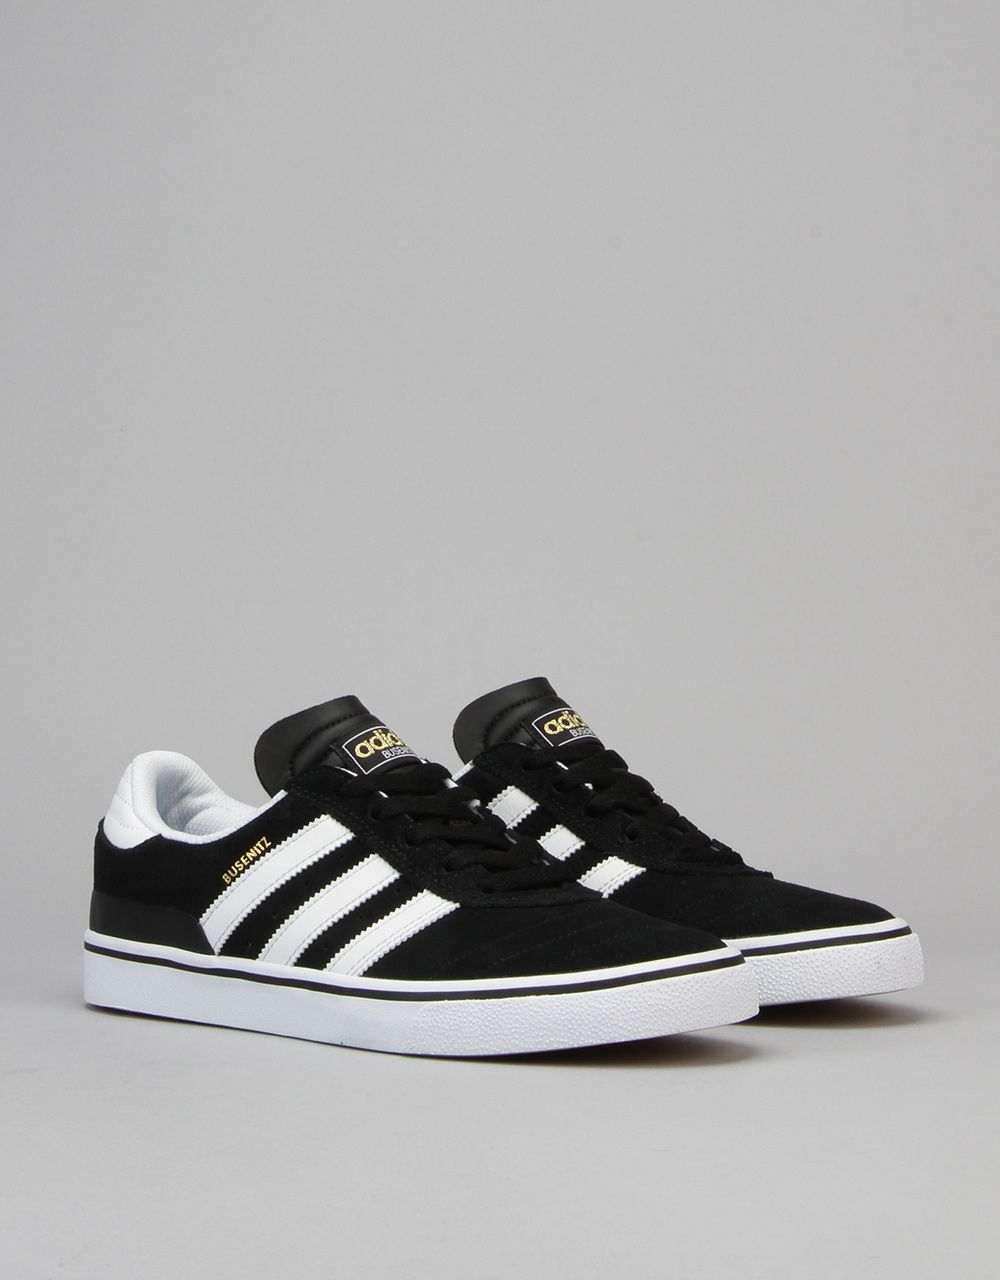 premium selection a9c31 3cdeb Adidas Busenitz Vulc Skate Shoes - Black Running White Black -  RouteOne.co.uk